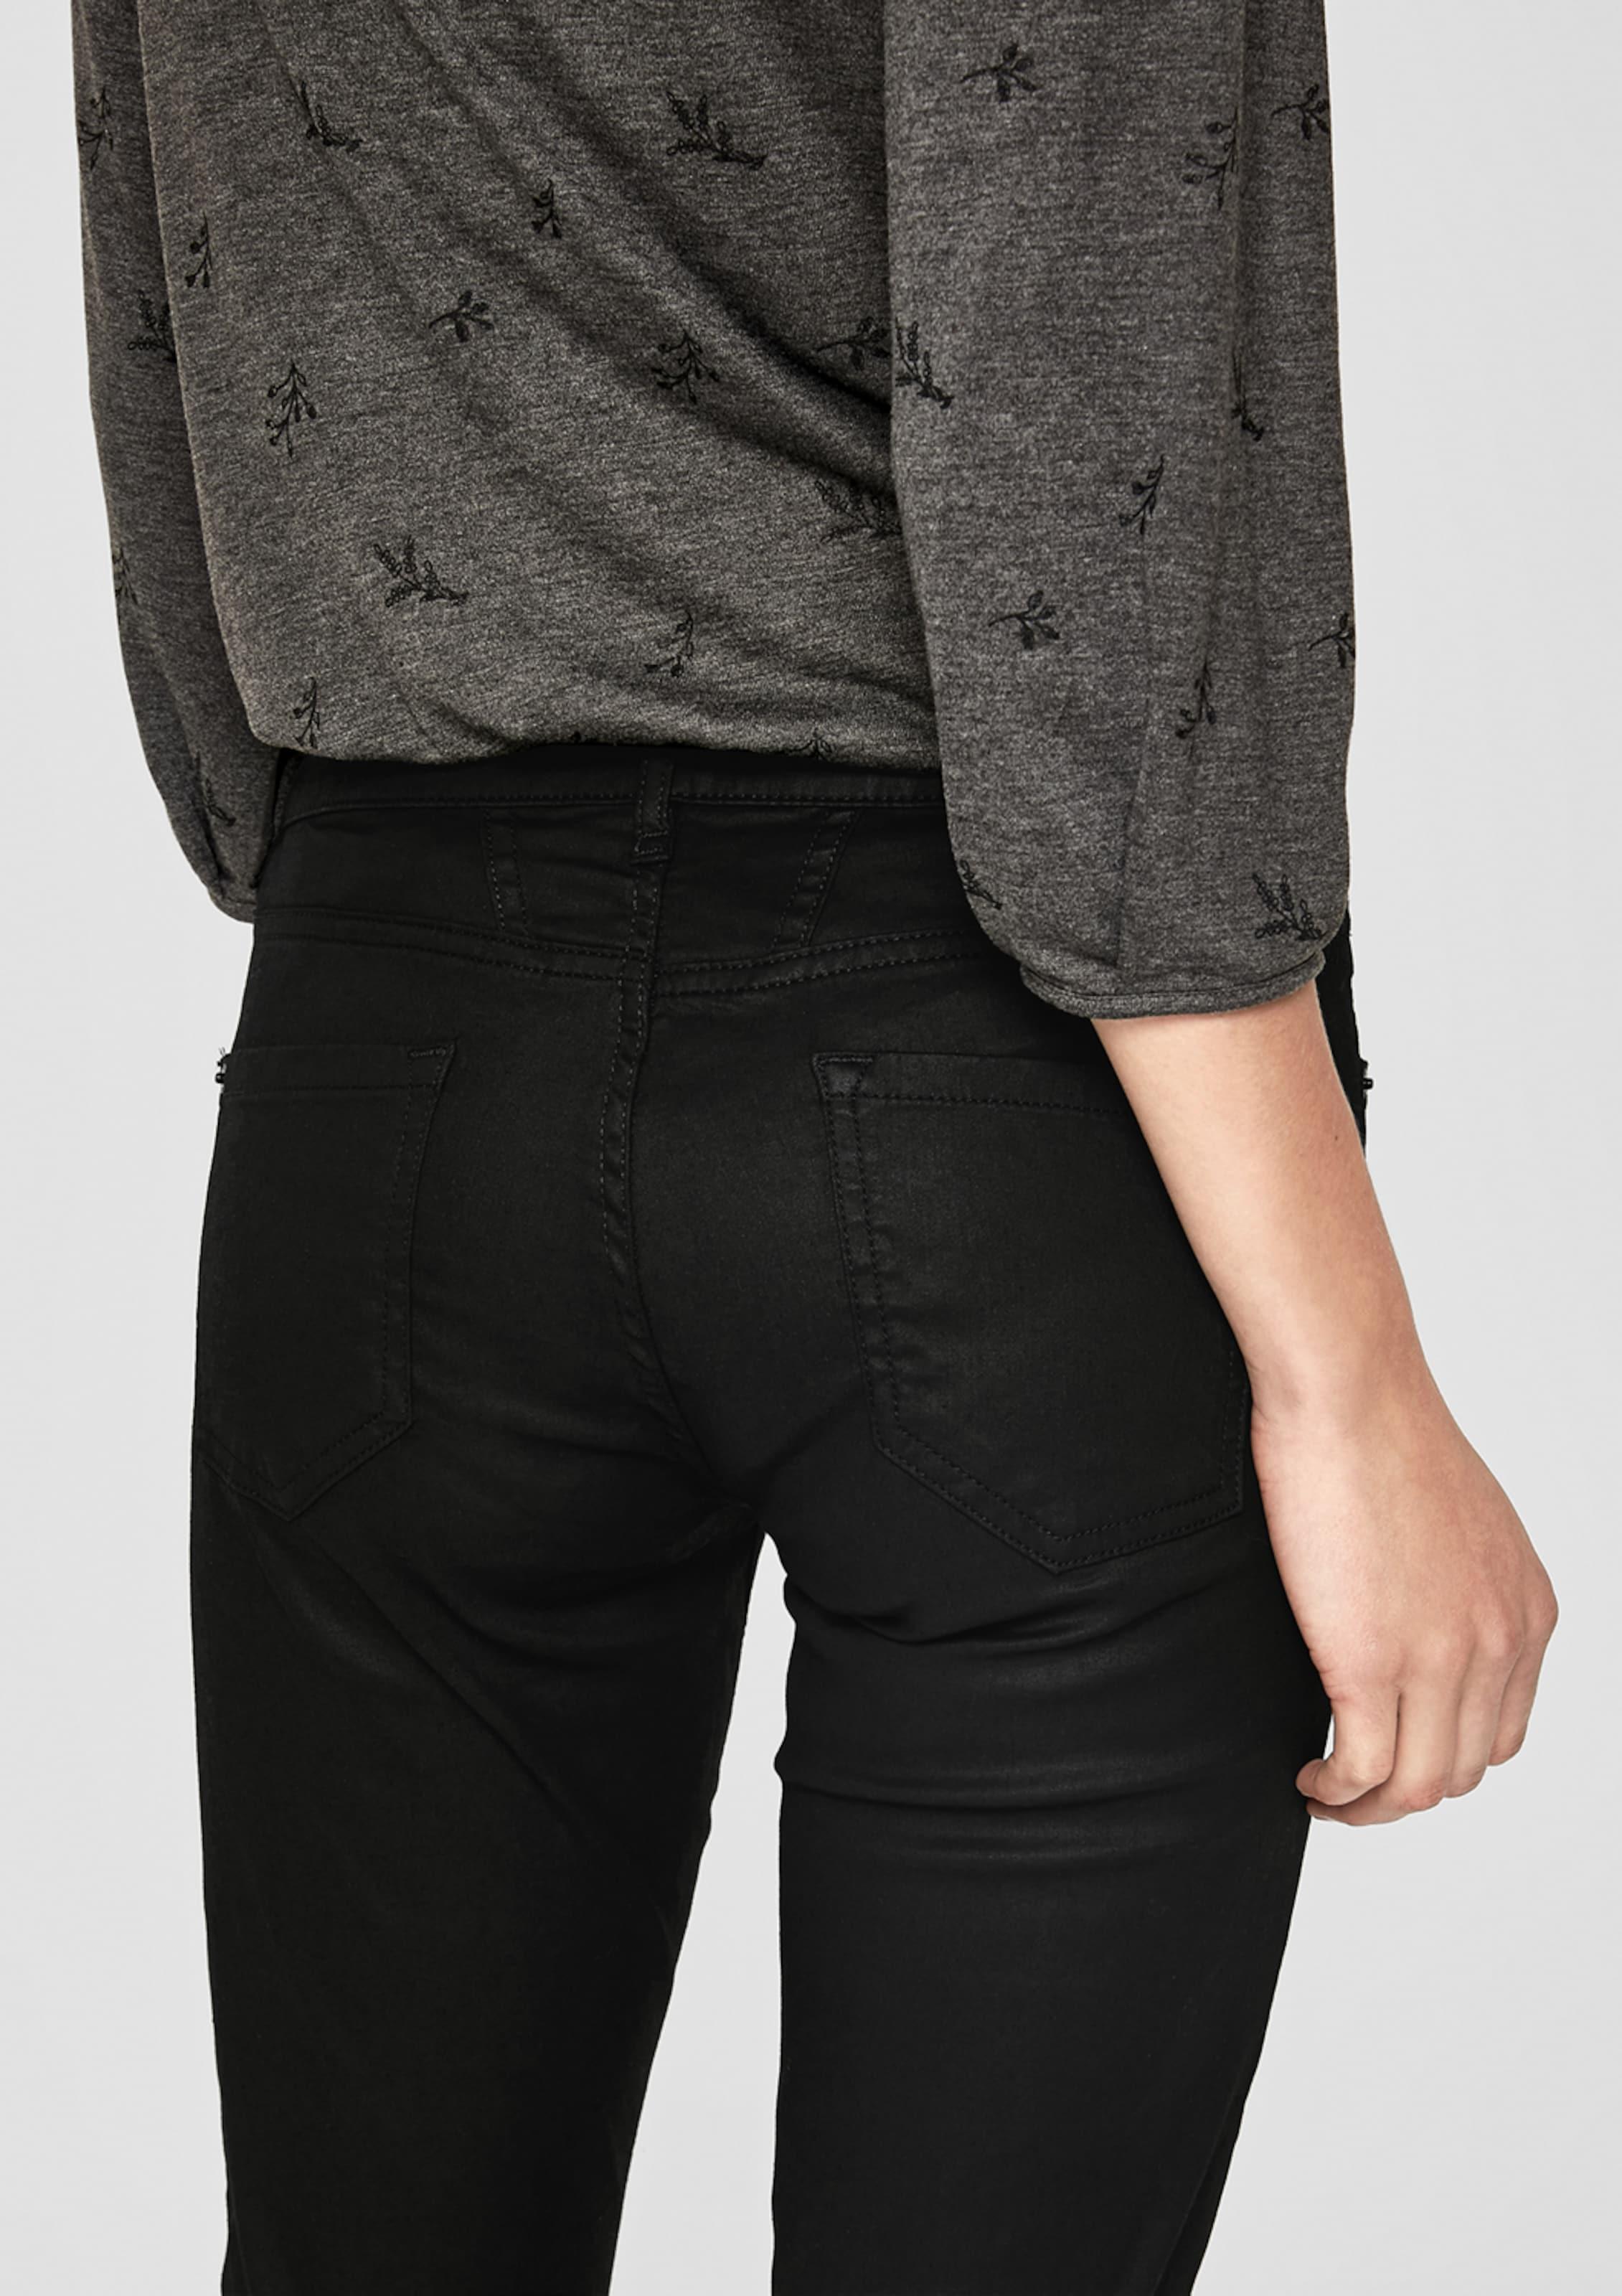 Red oliver In Jeans Label Black S Denim rCxeWBod